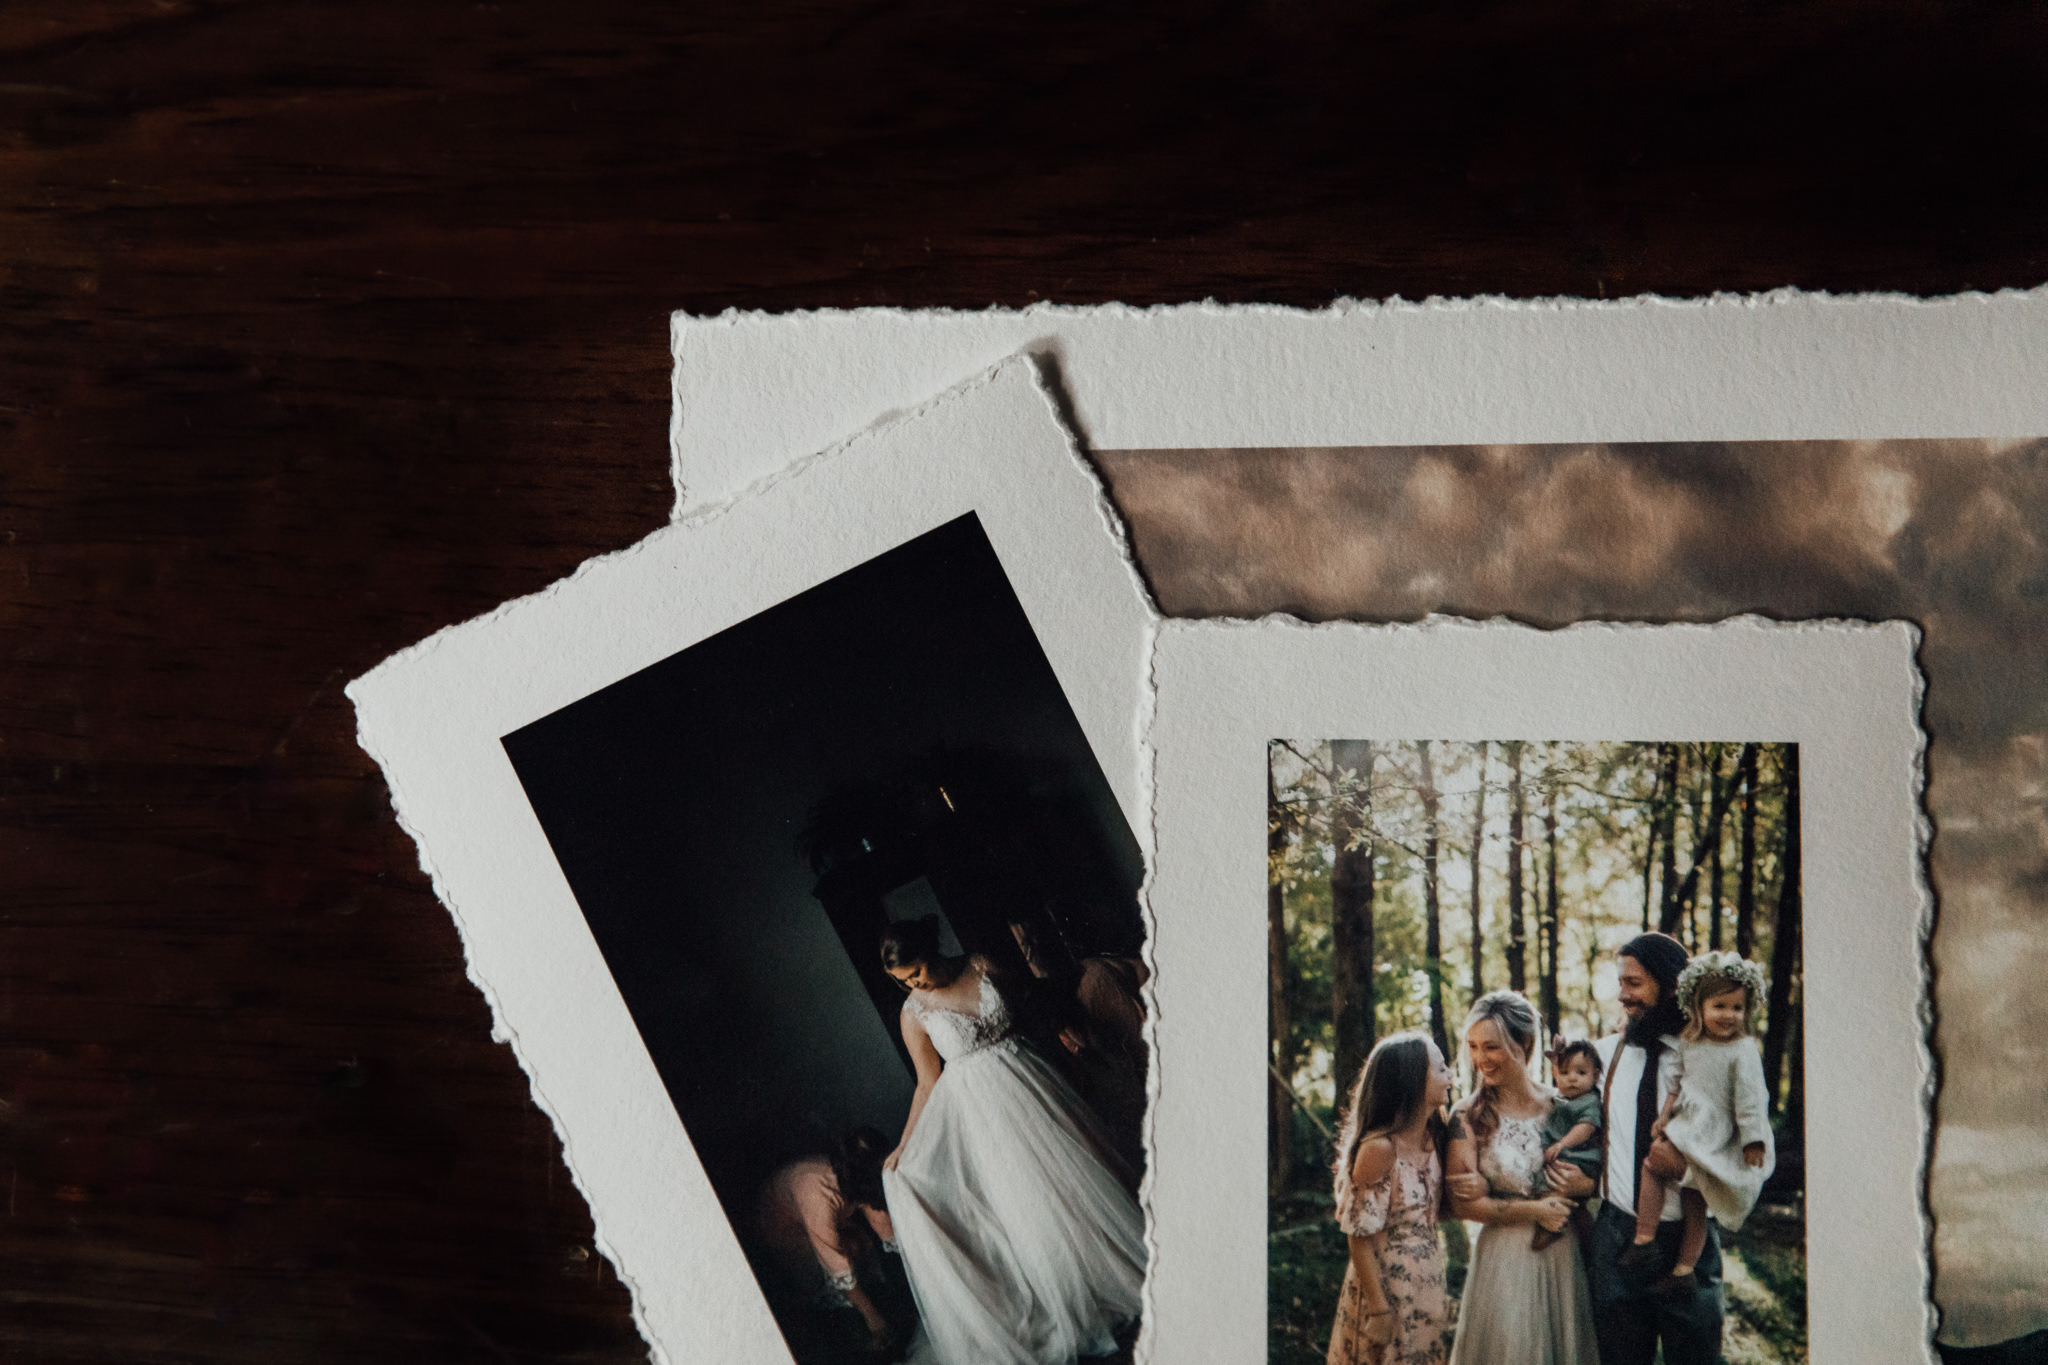 memphis-wedding-photographer-thewarmtharoundyou-3.jpg